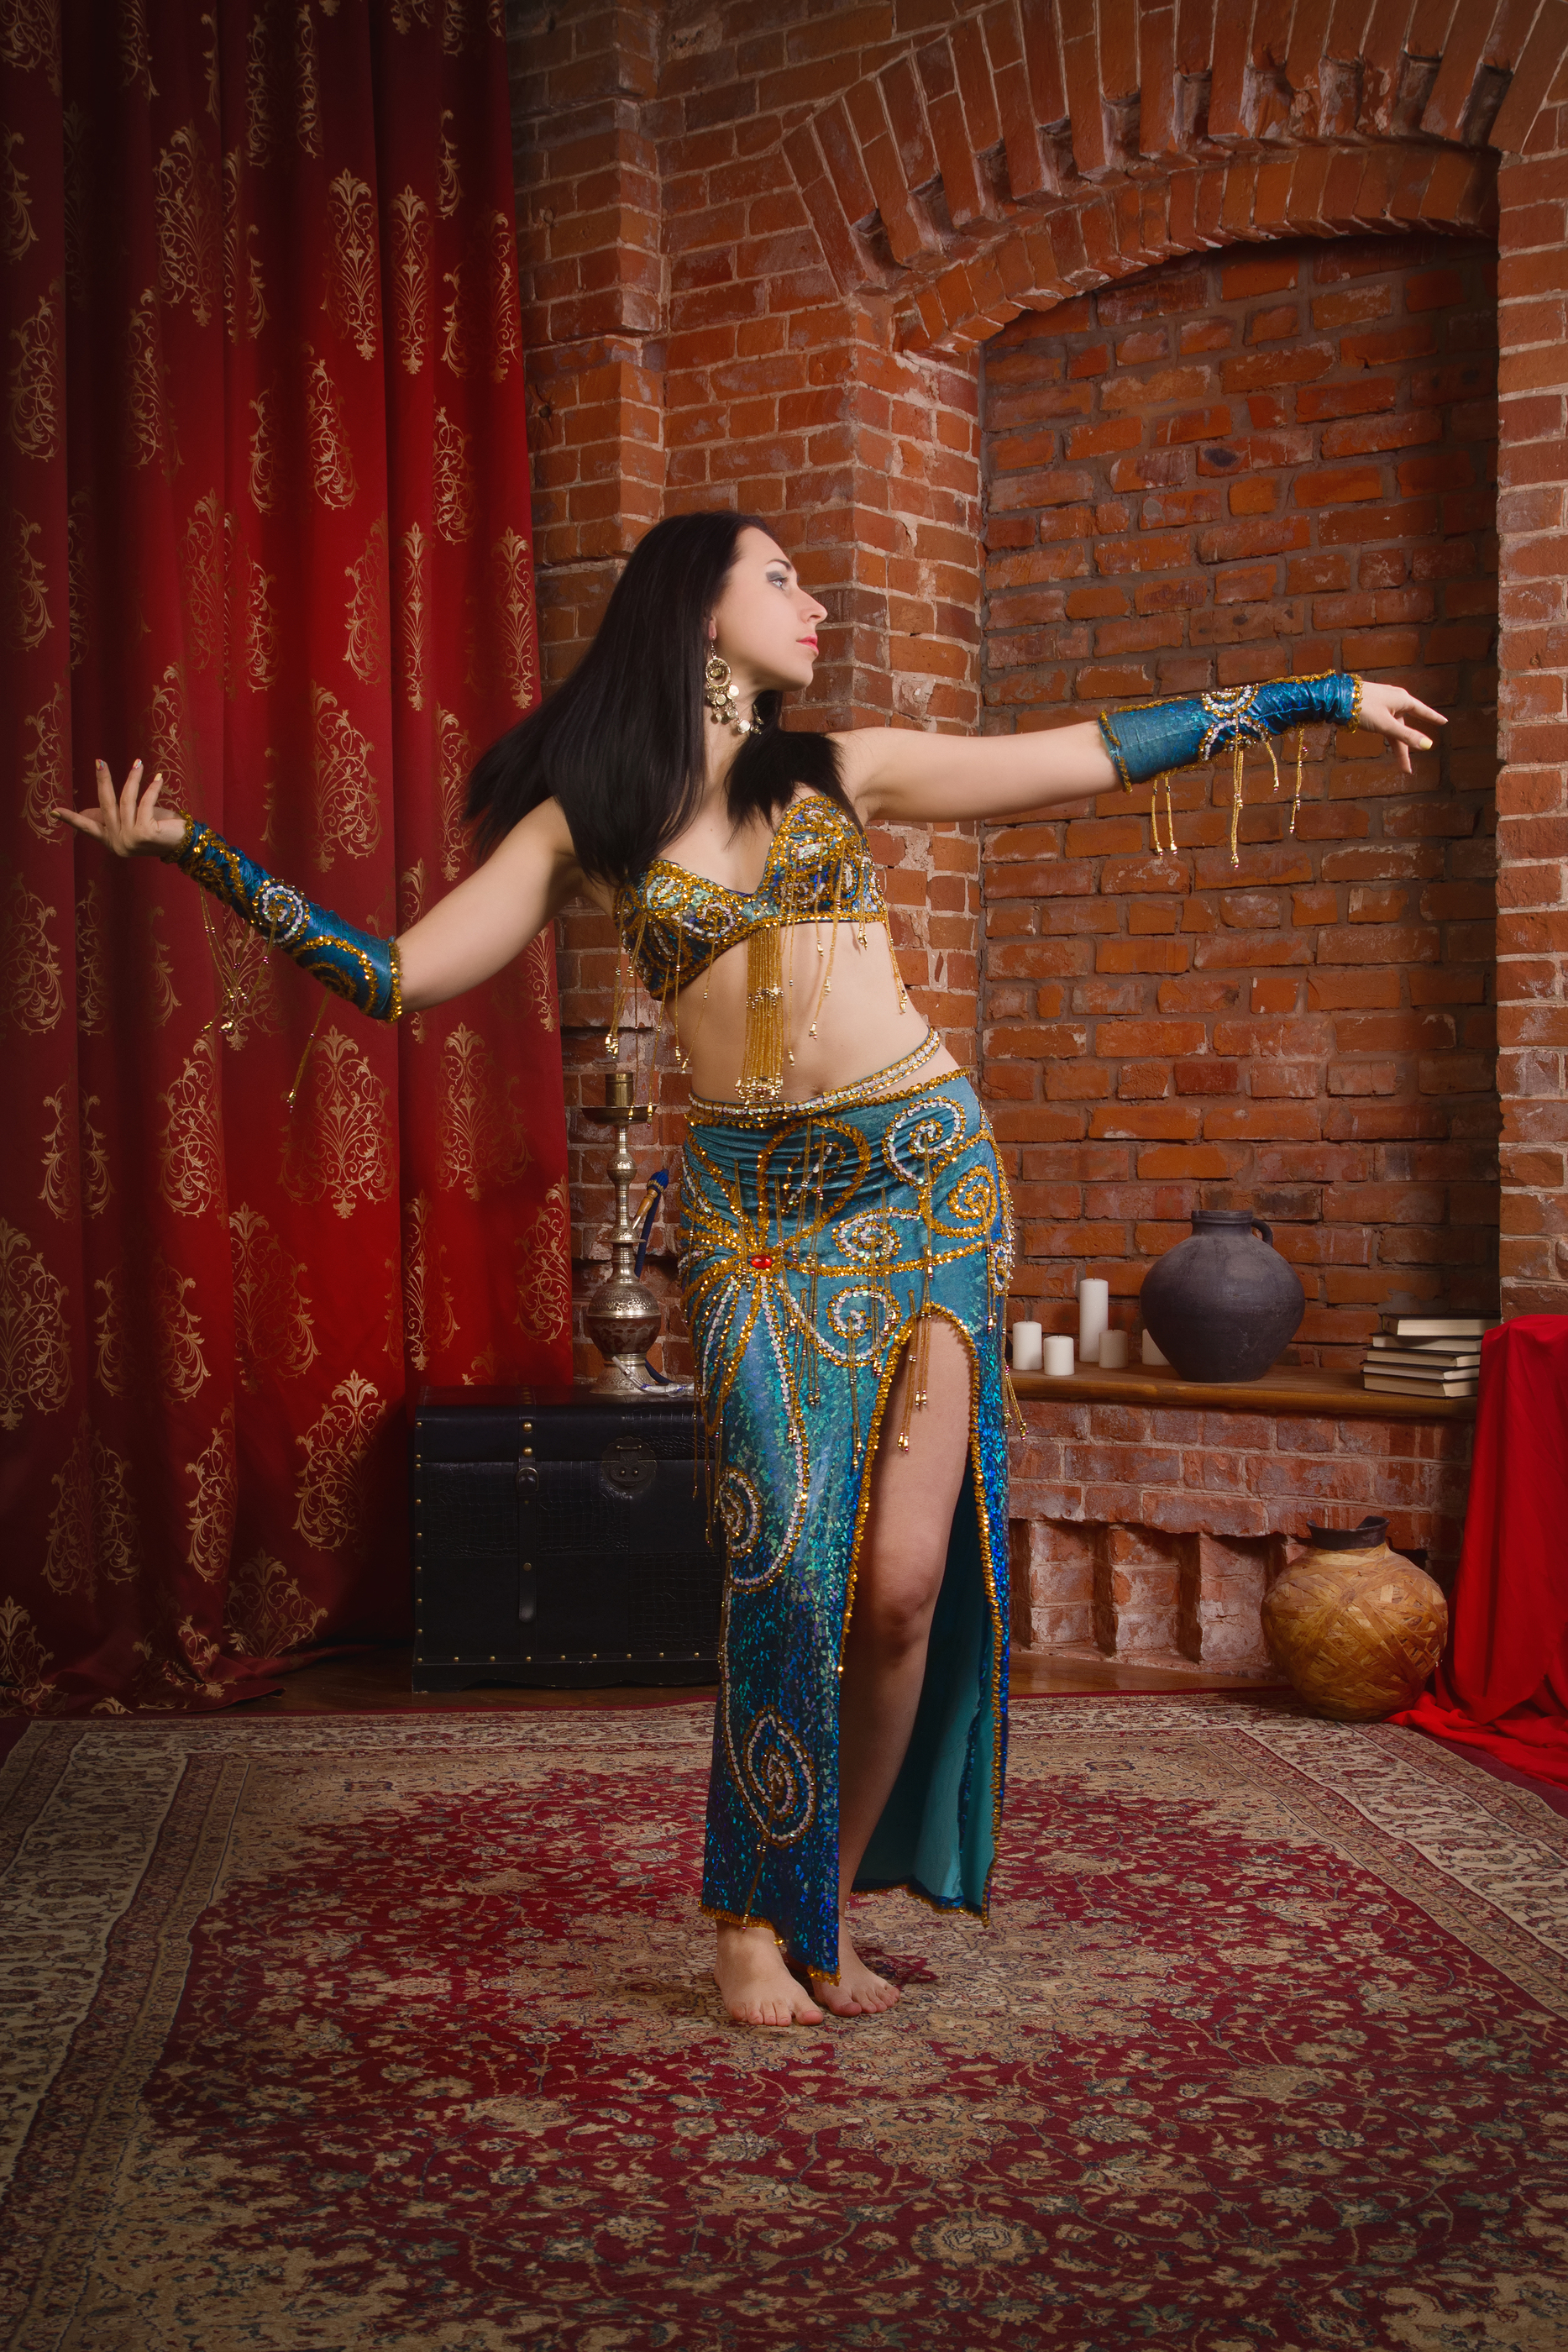 bigstock-Beautiful-Traditional-Female-D-133139030.jpg